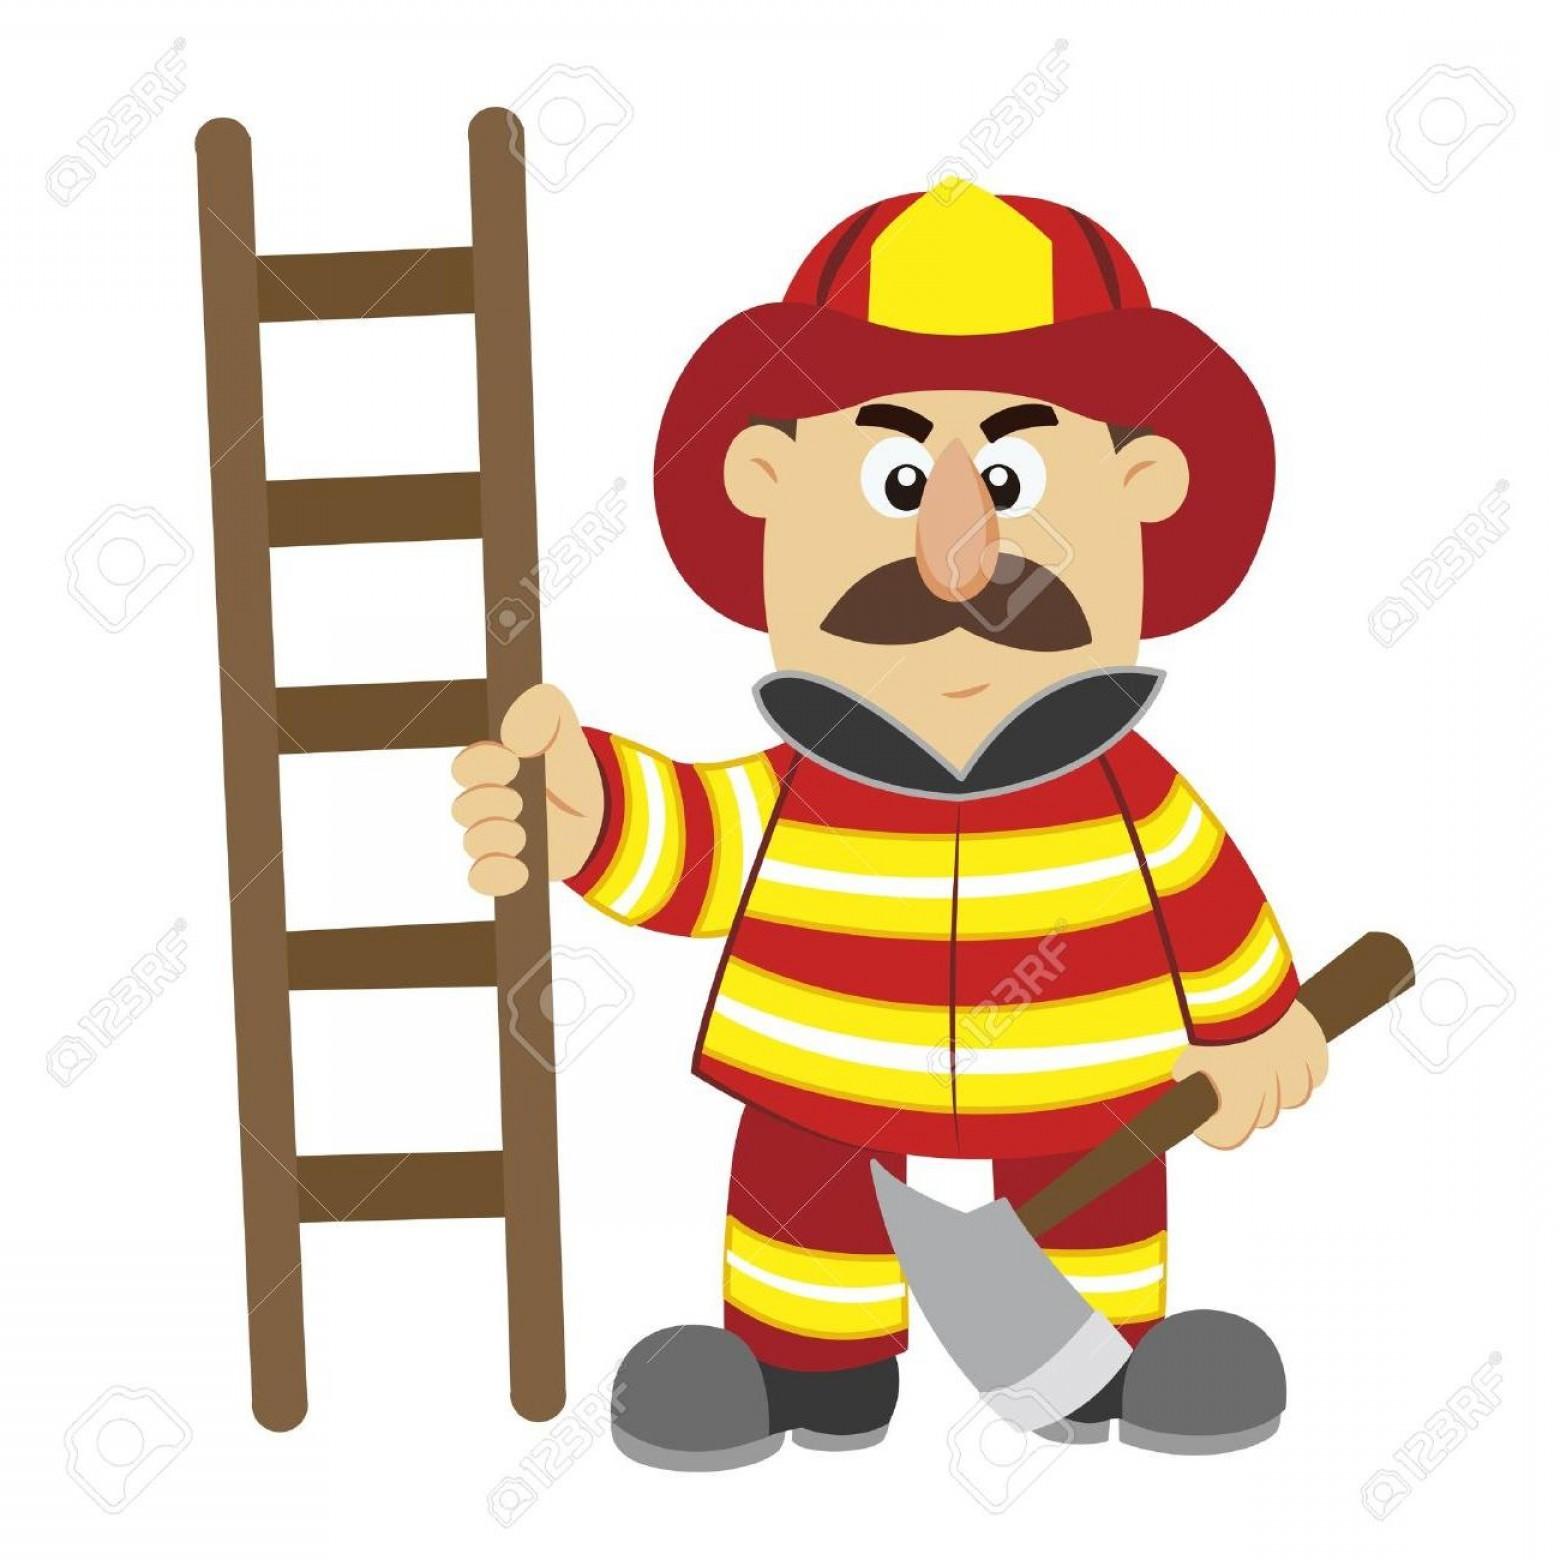 1560x1560 Best Free An Illustration Of Cartoon Fireman Vector Stock